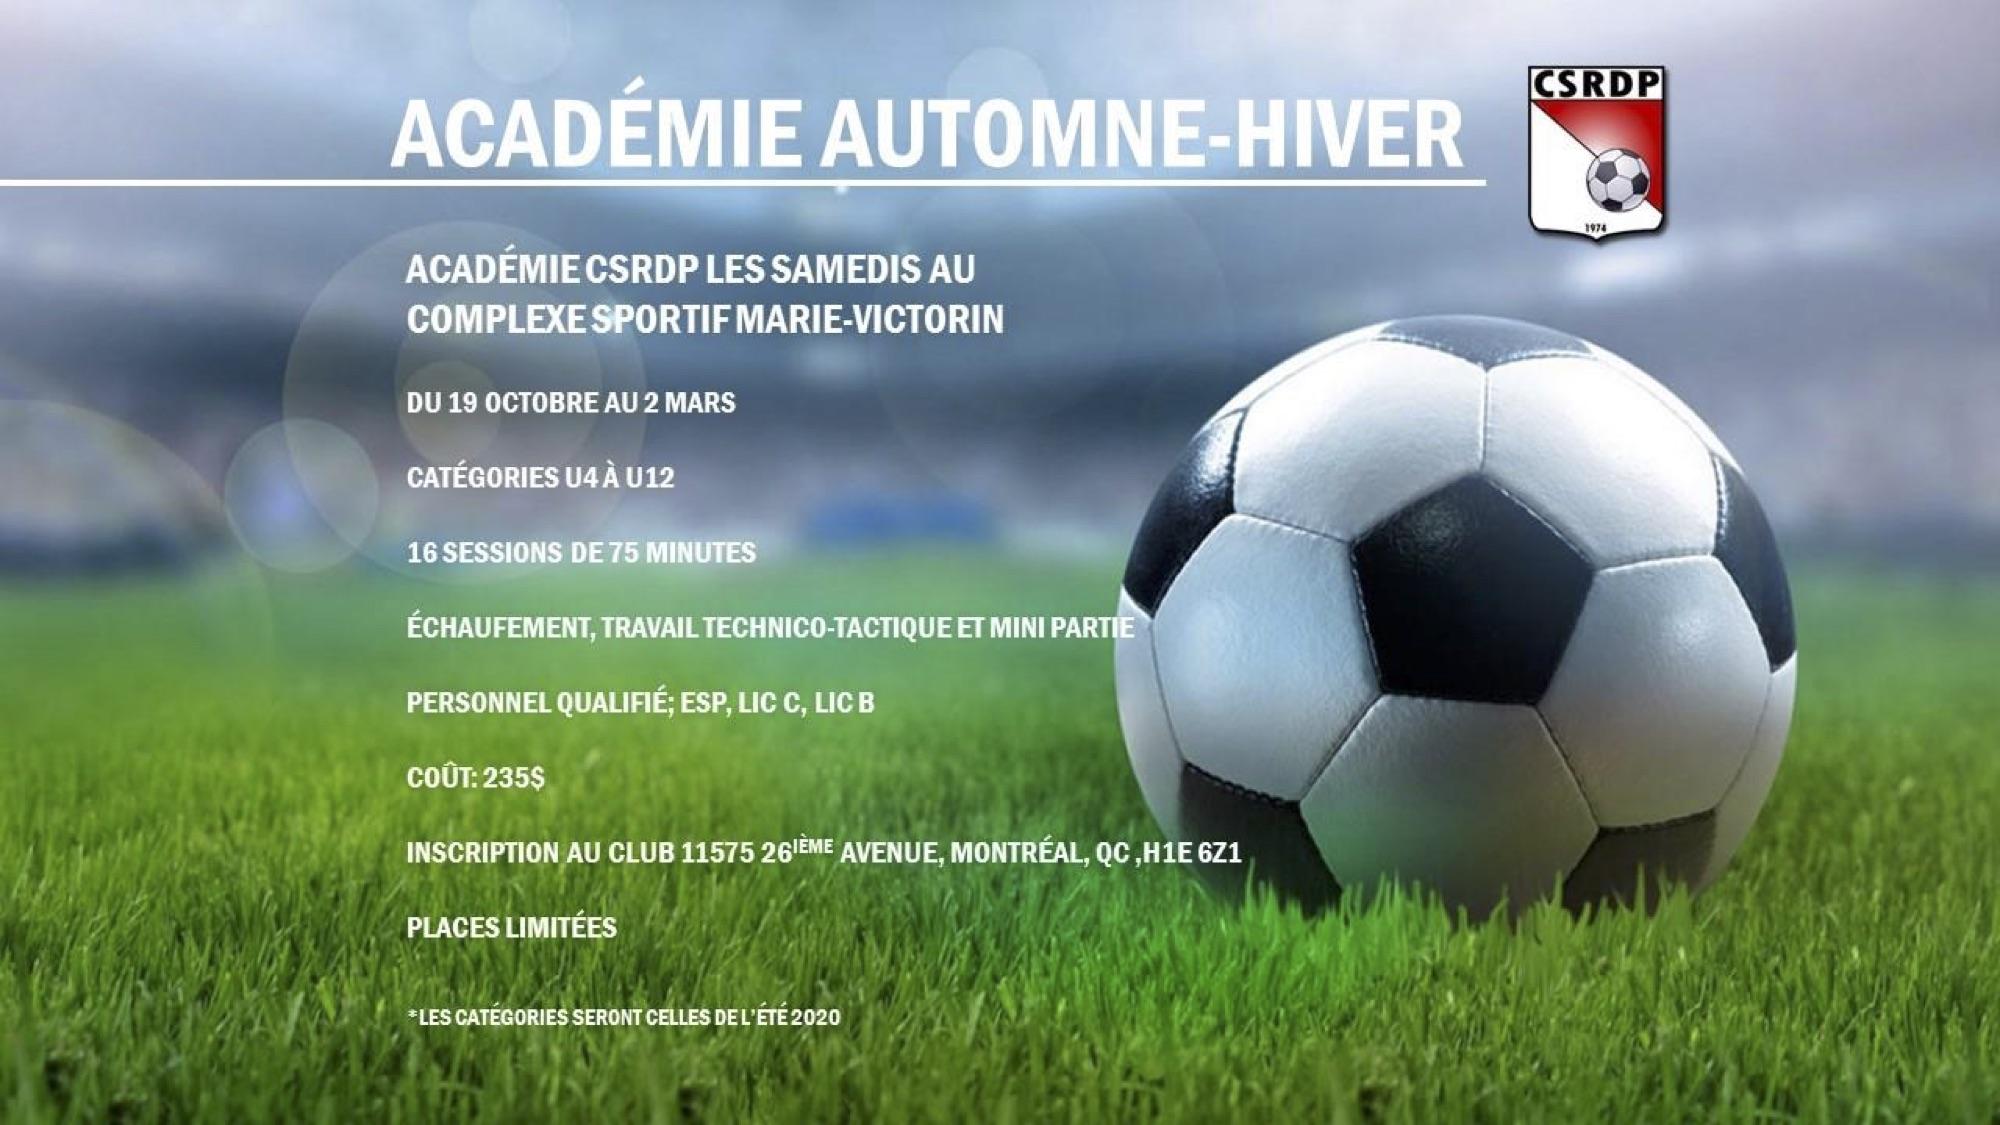 academie automne hiver 2019.jpg